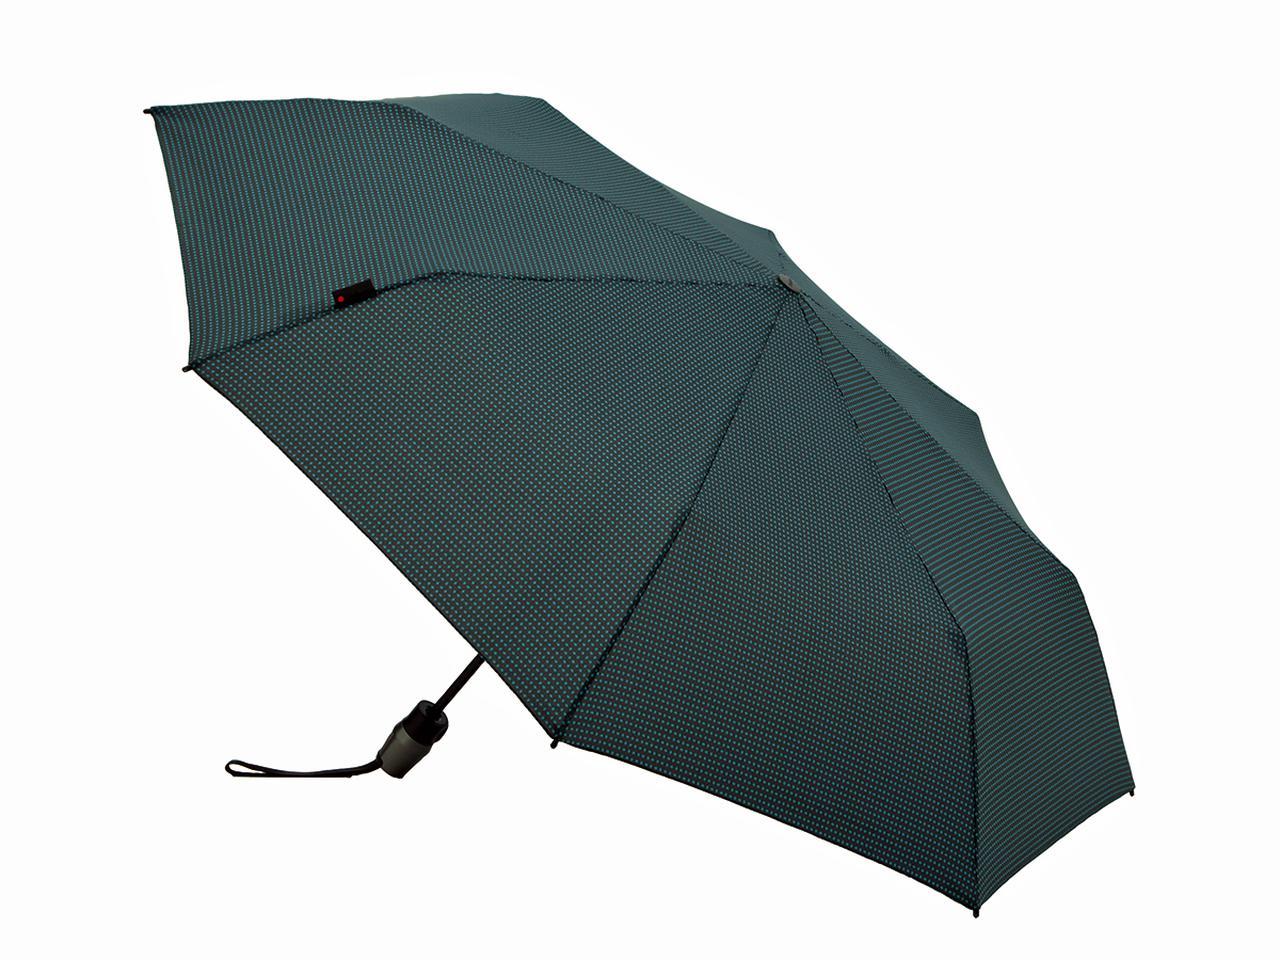 Images : 7番目の画像 - 「クニルプス」自動開閉式折りたたみ傘 - Webモーターマガジン